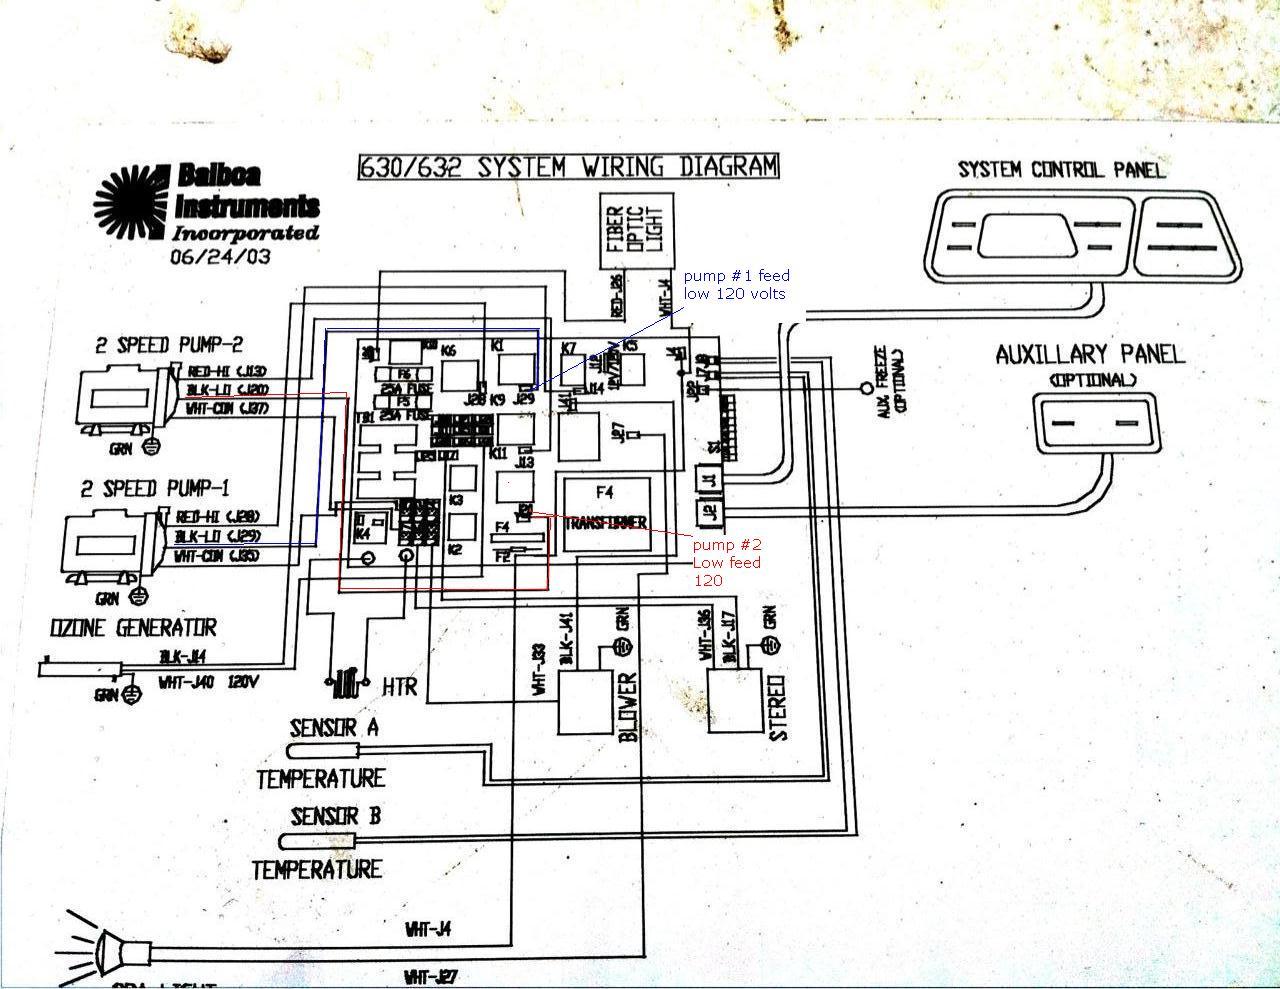 image spa command panel manual